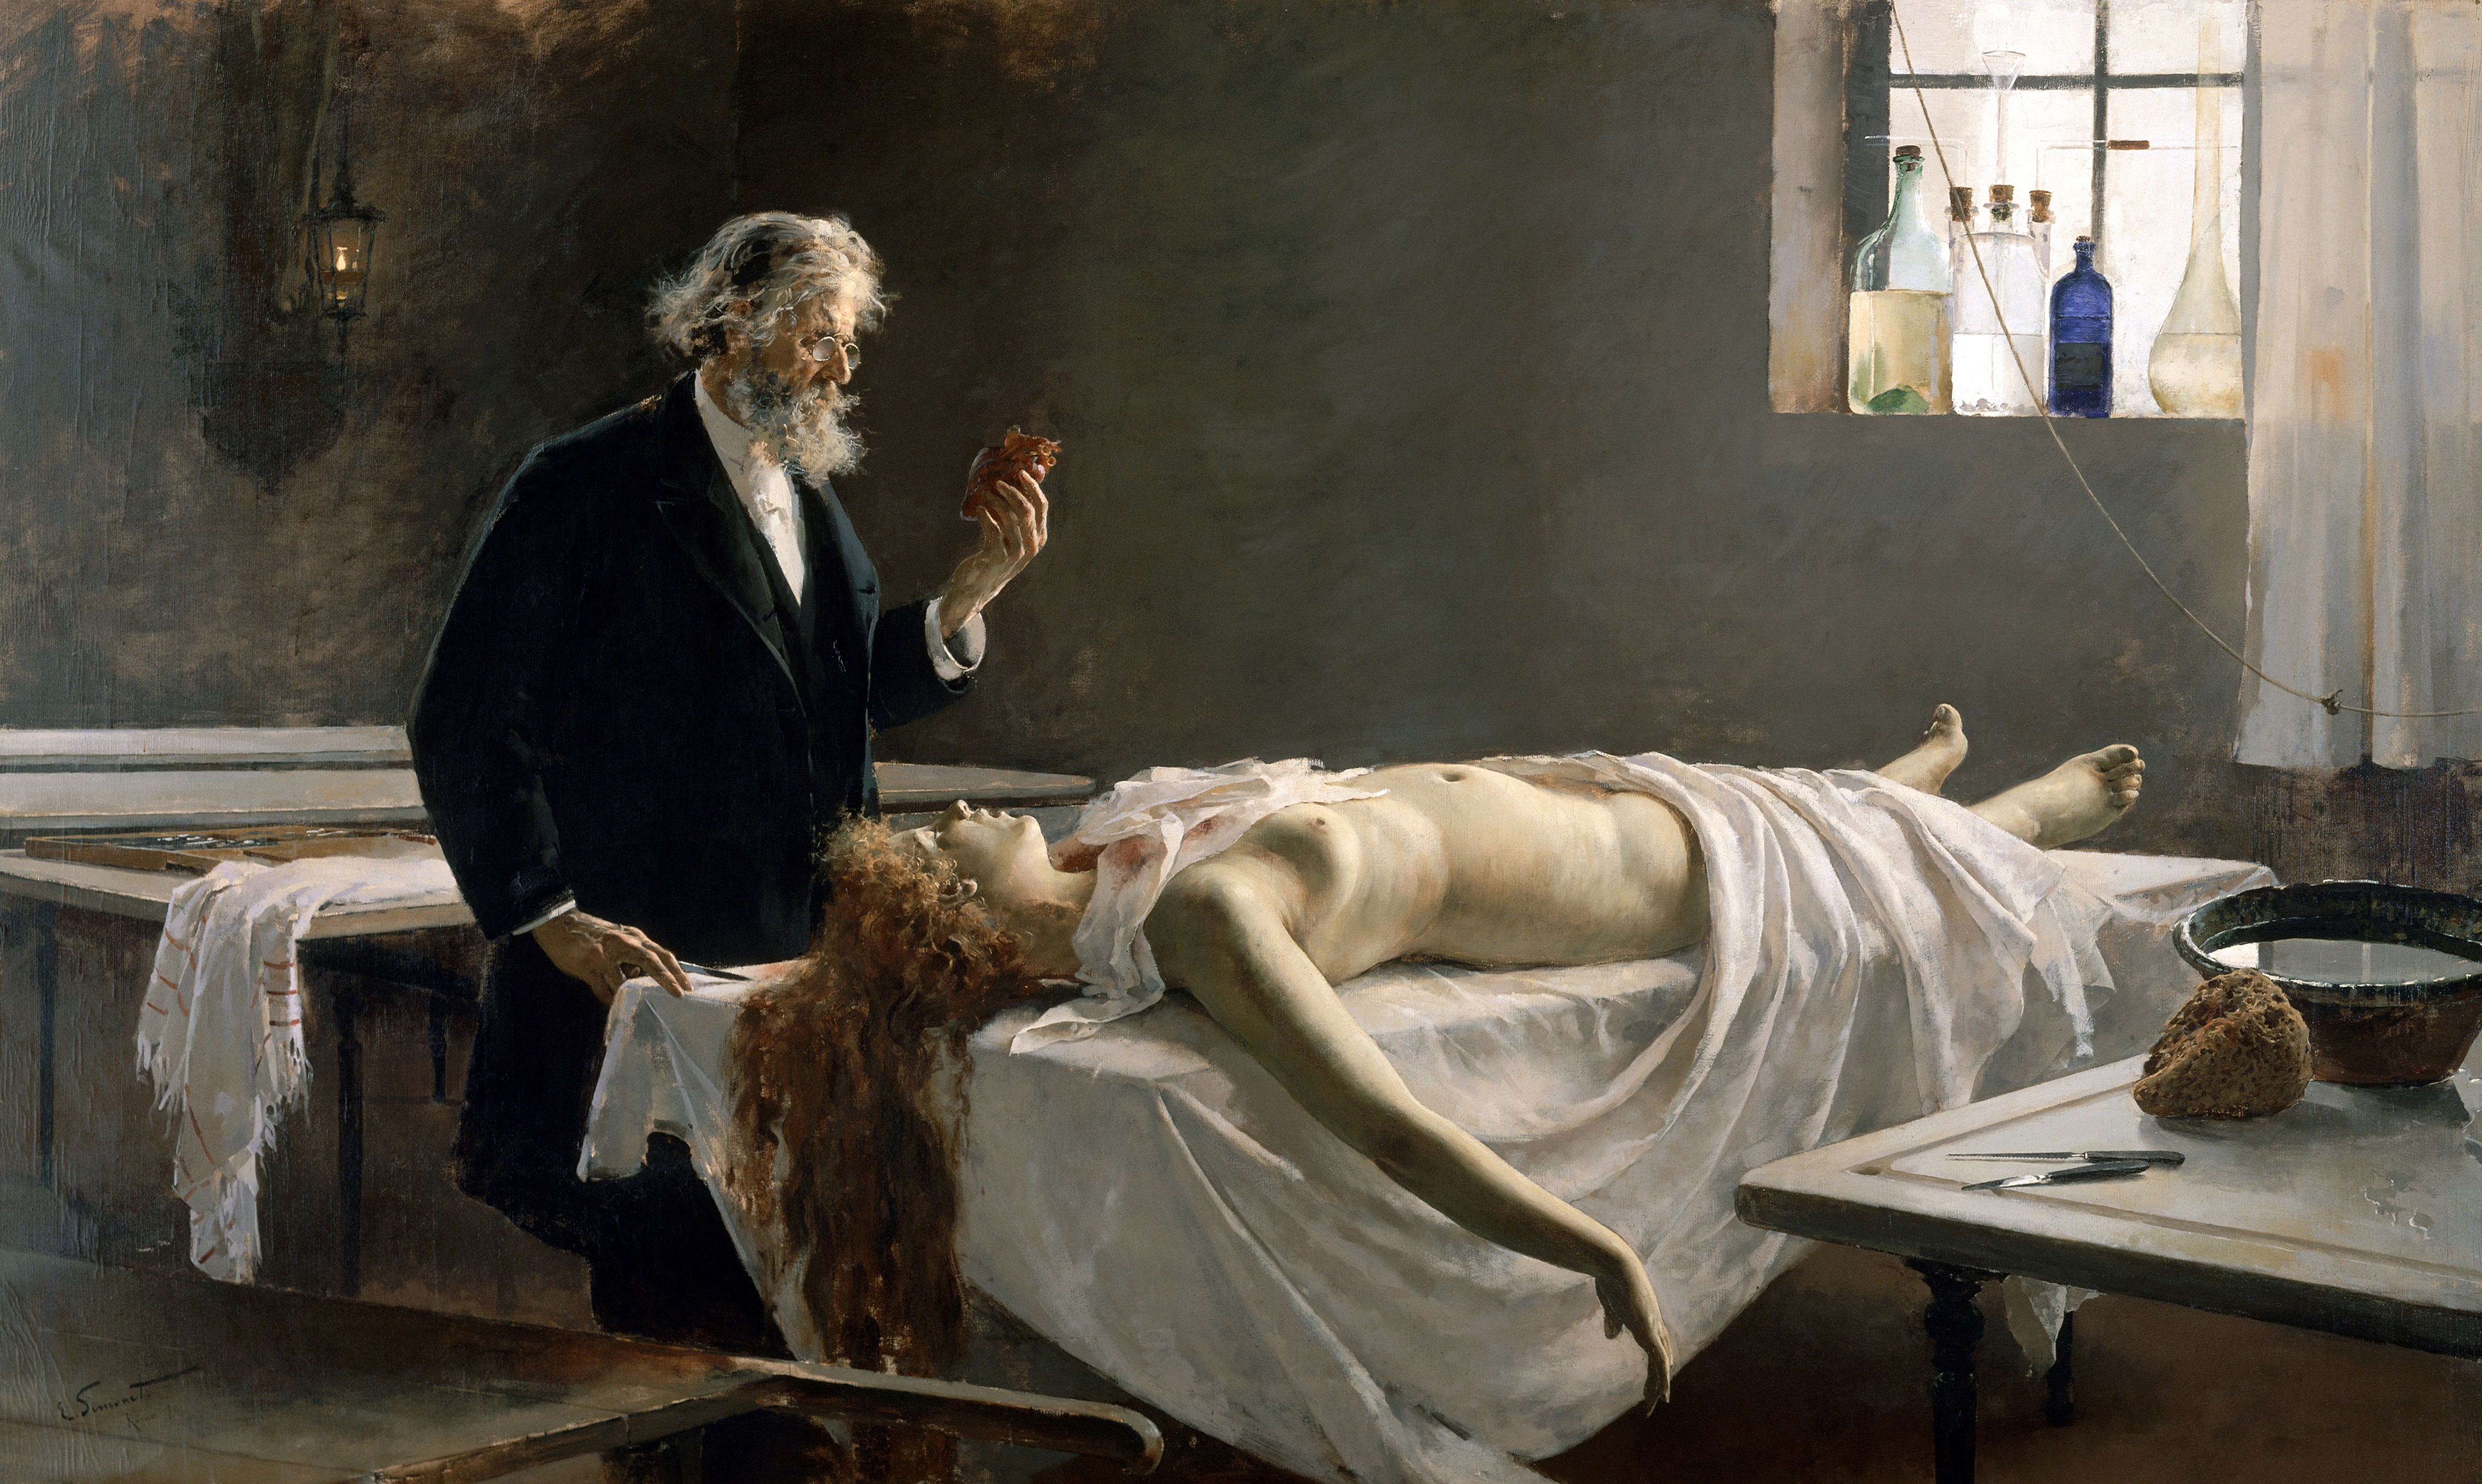 Enrique Simonet - La autopsia - 1890.jpg